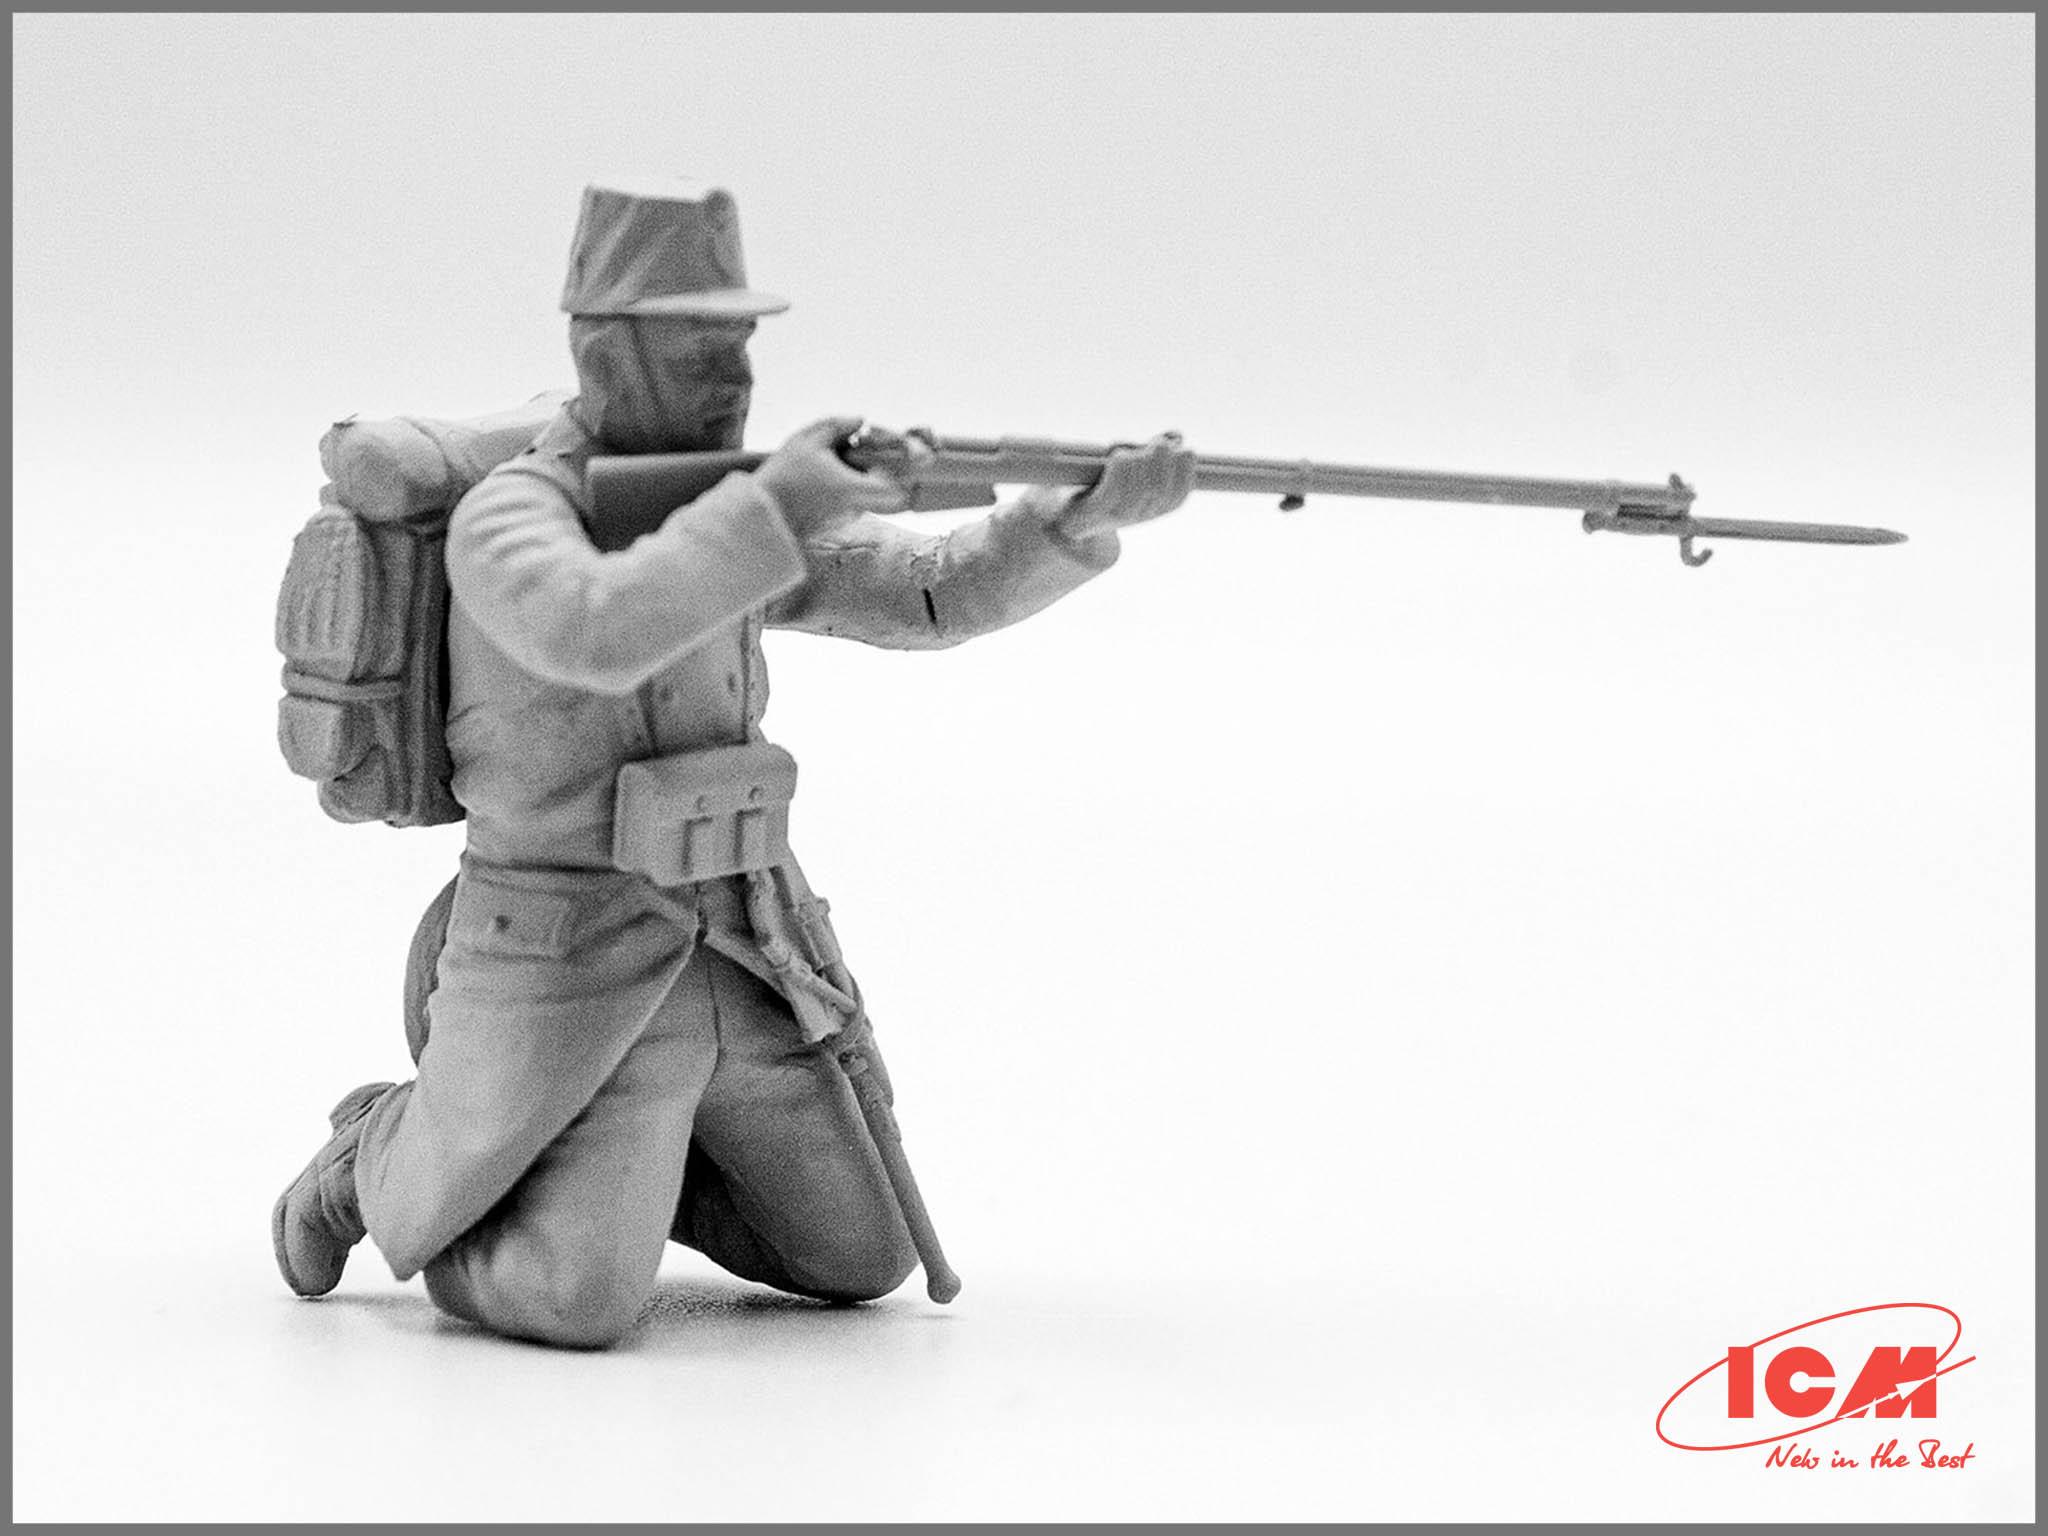 35680_cropped_Belgian_infantry_icm_5